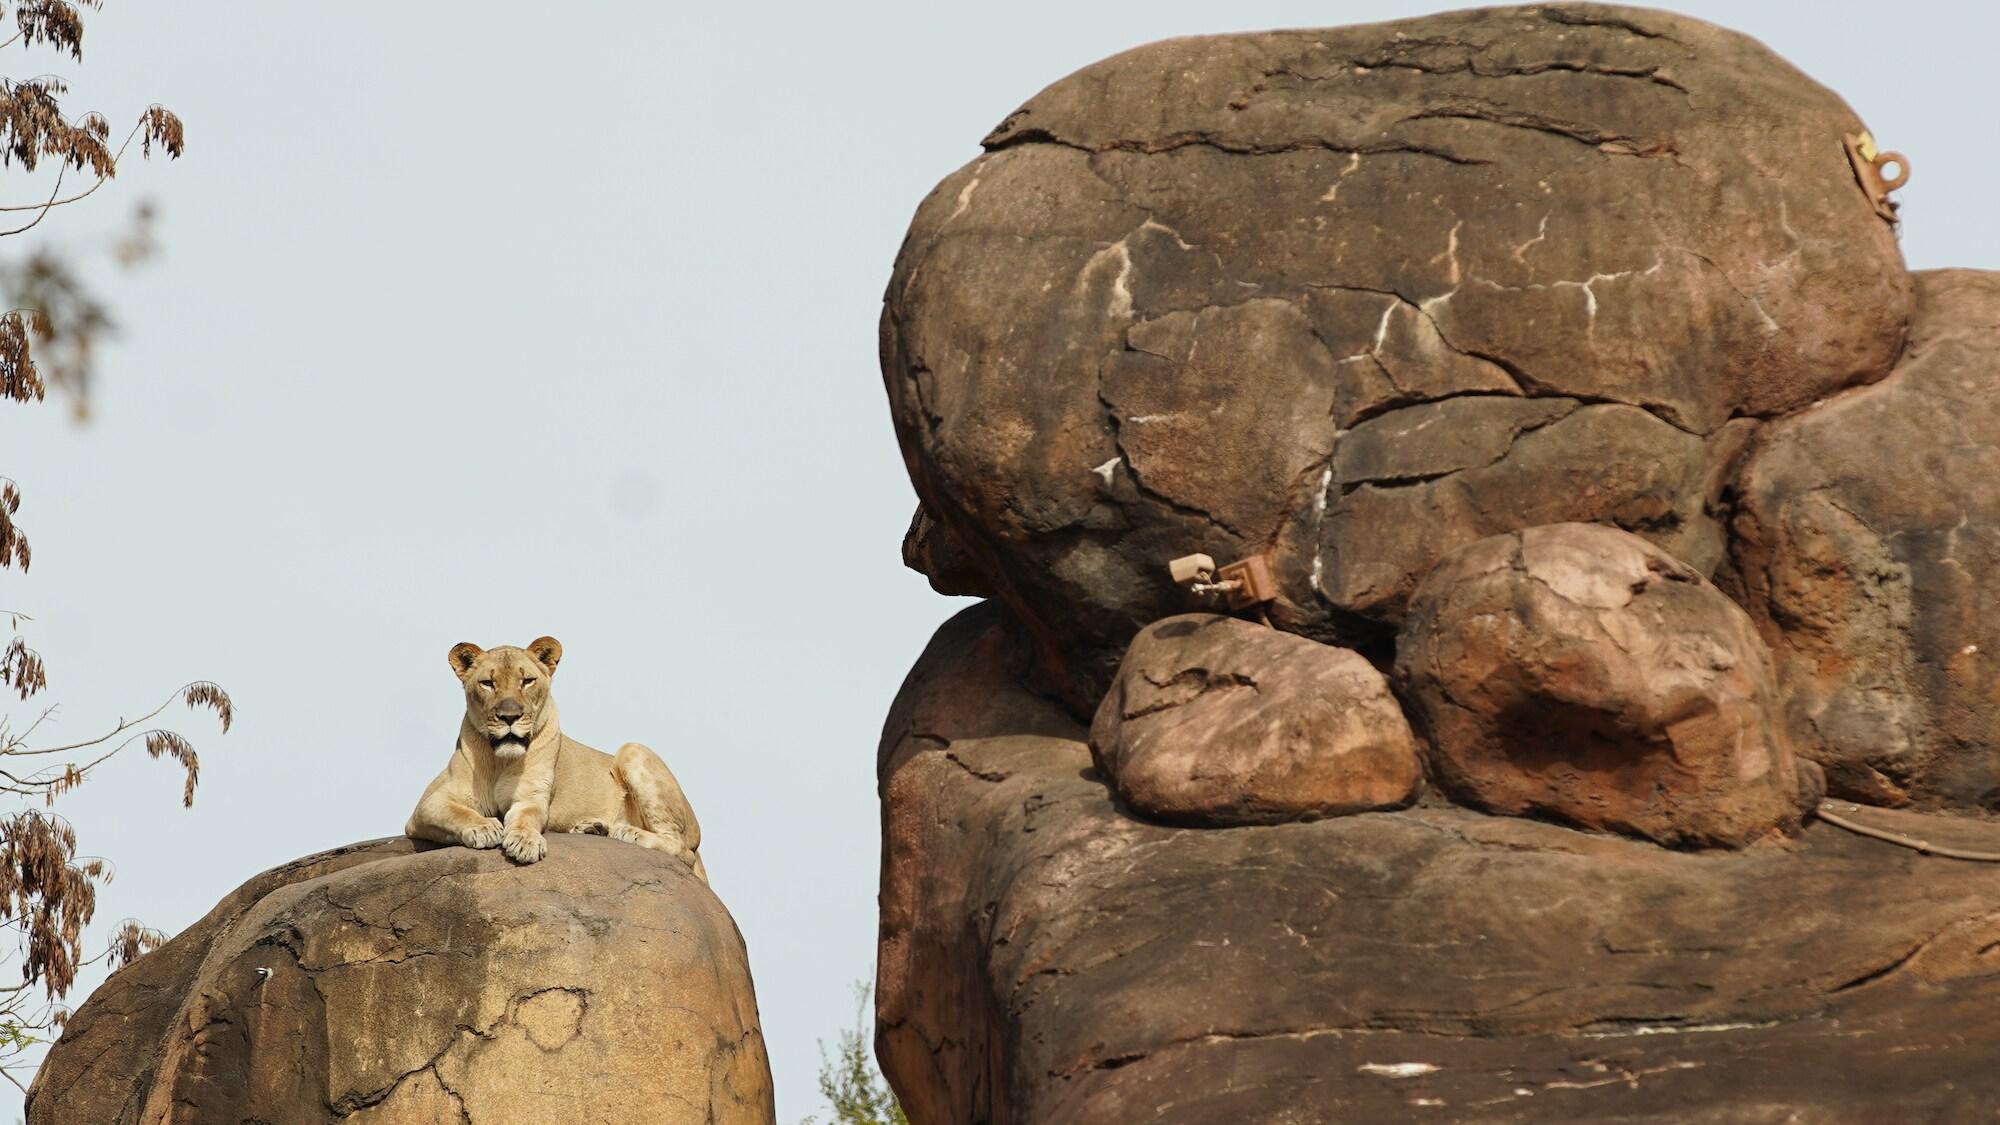 Kamari the lioness rests on the savannah at the Harambe Wildlife Reserve. (Disney)